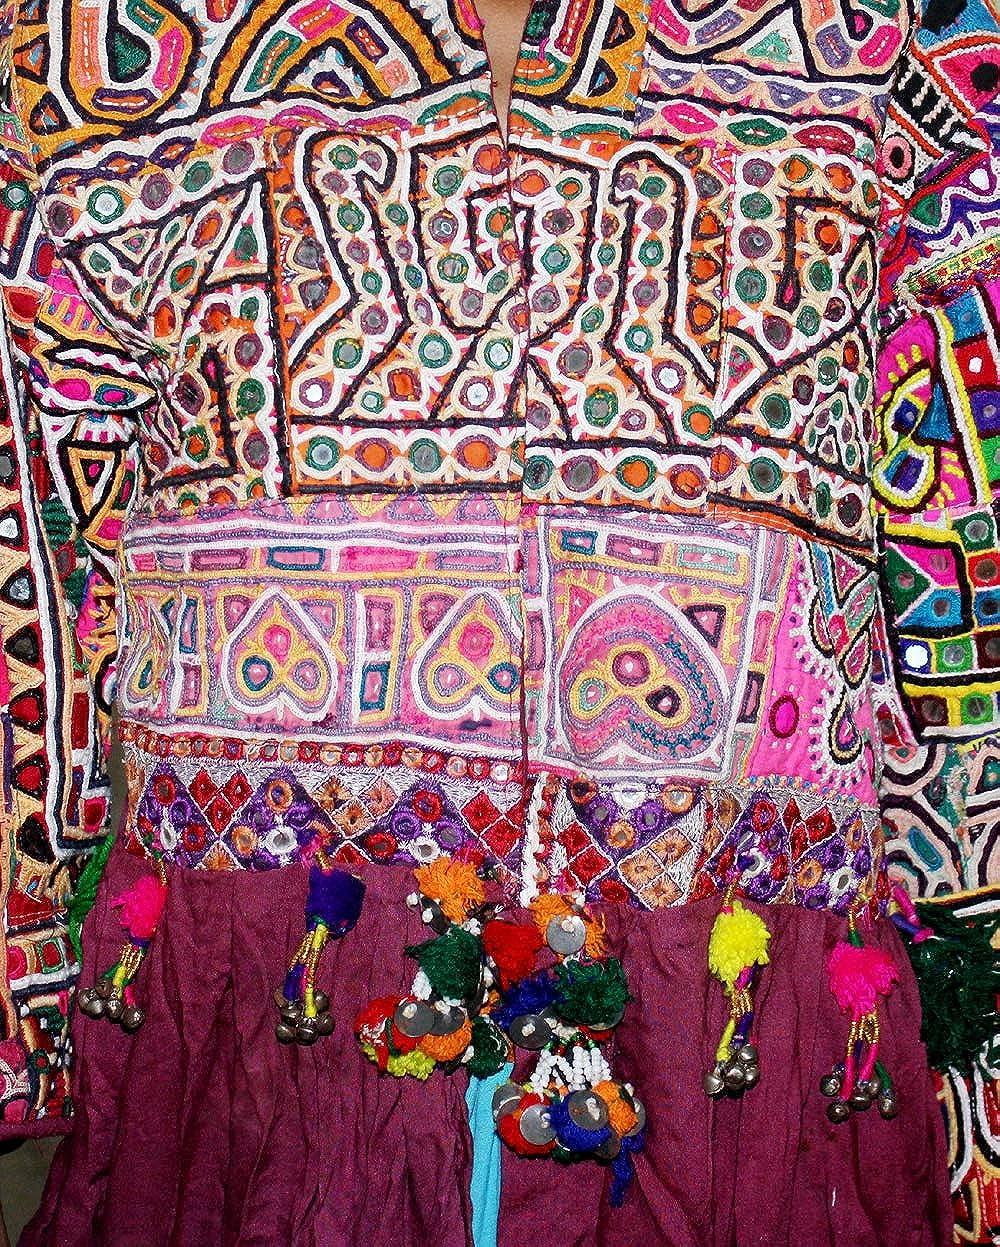 Lakkar Haveli Women's 100% Cotton Banjara Jacket Ethnic Girl's Jacket Burgundy Color Indian Casual Outwear